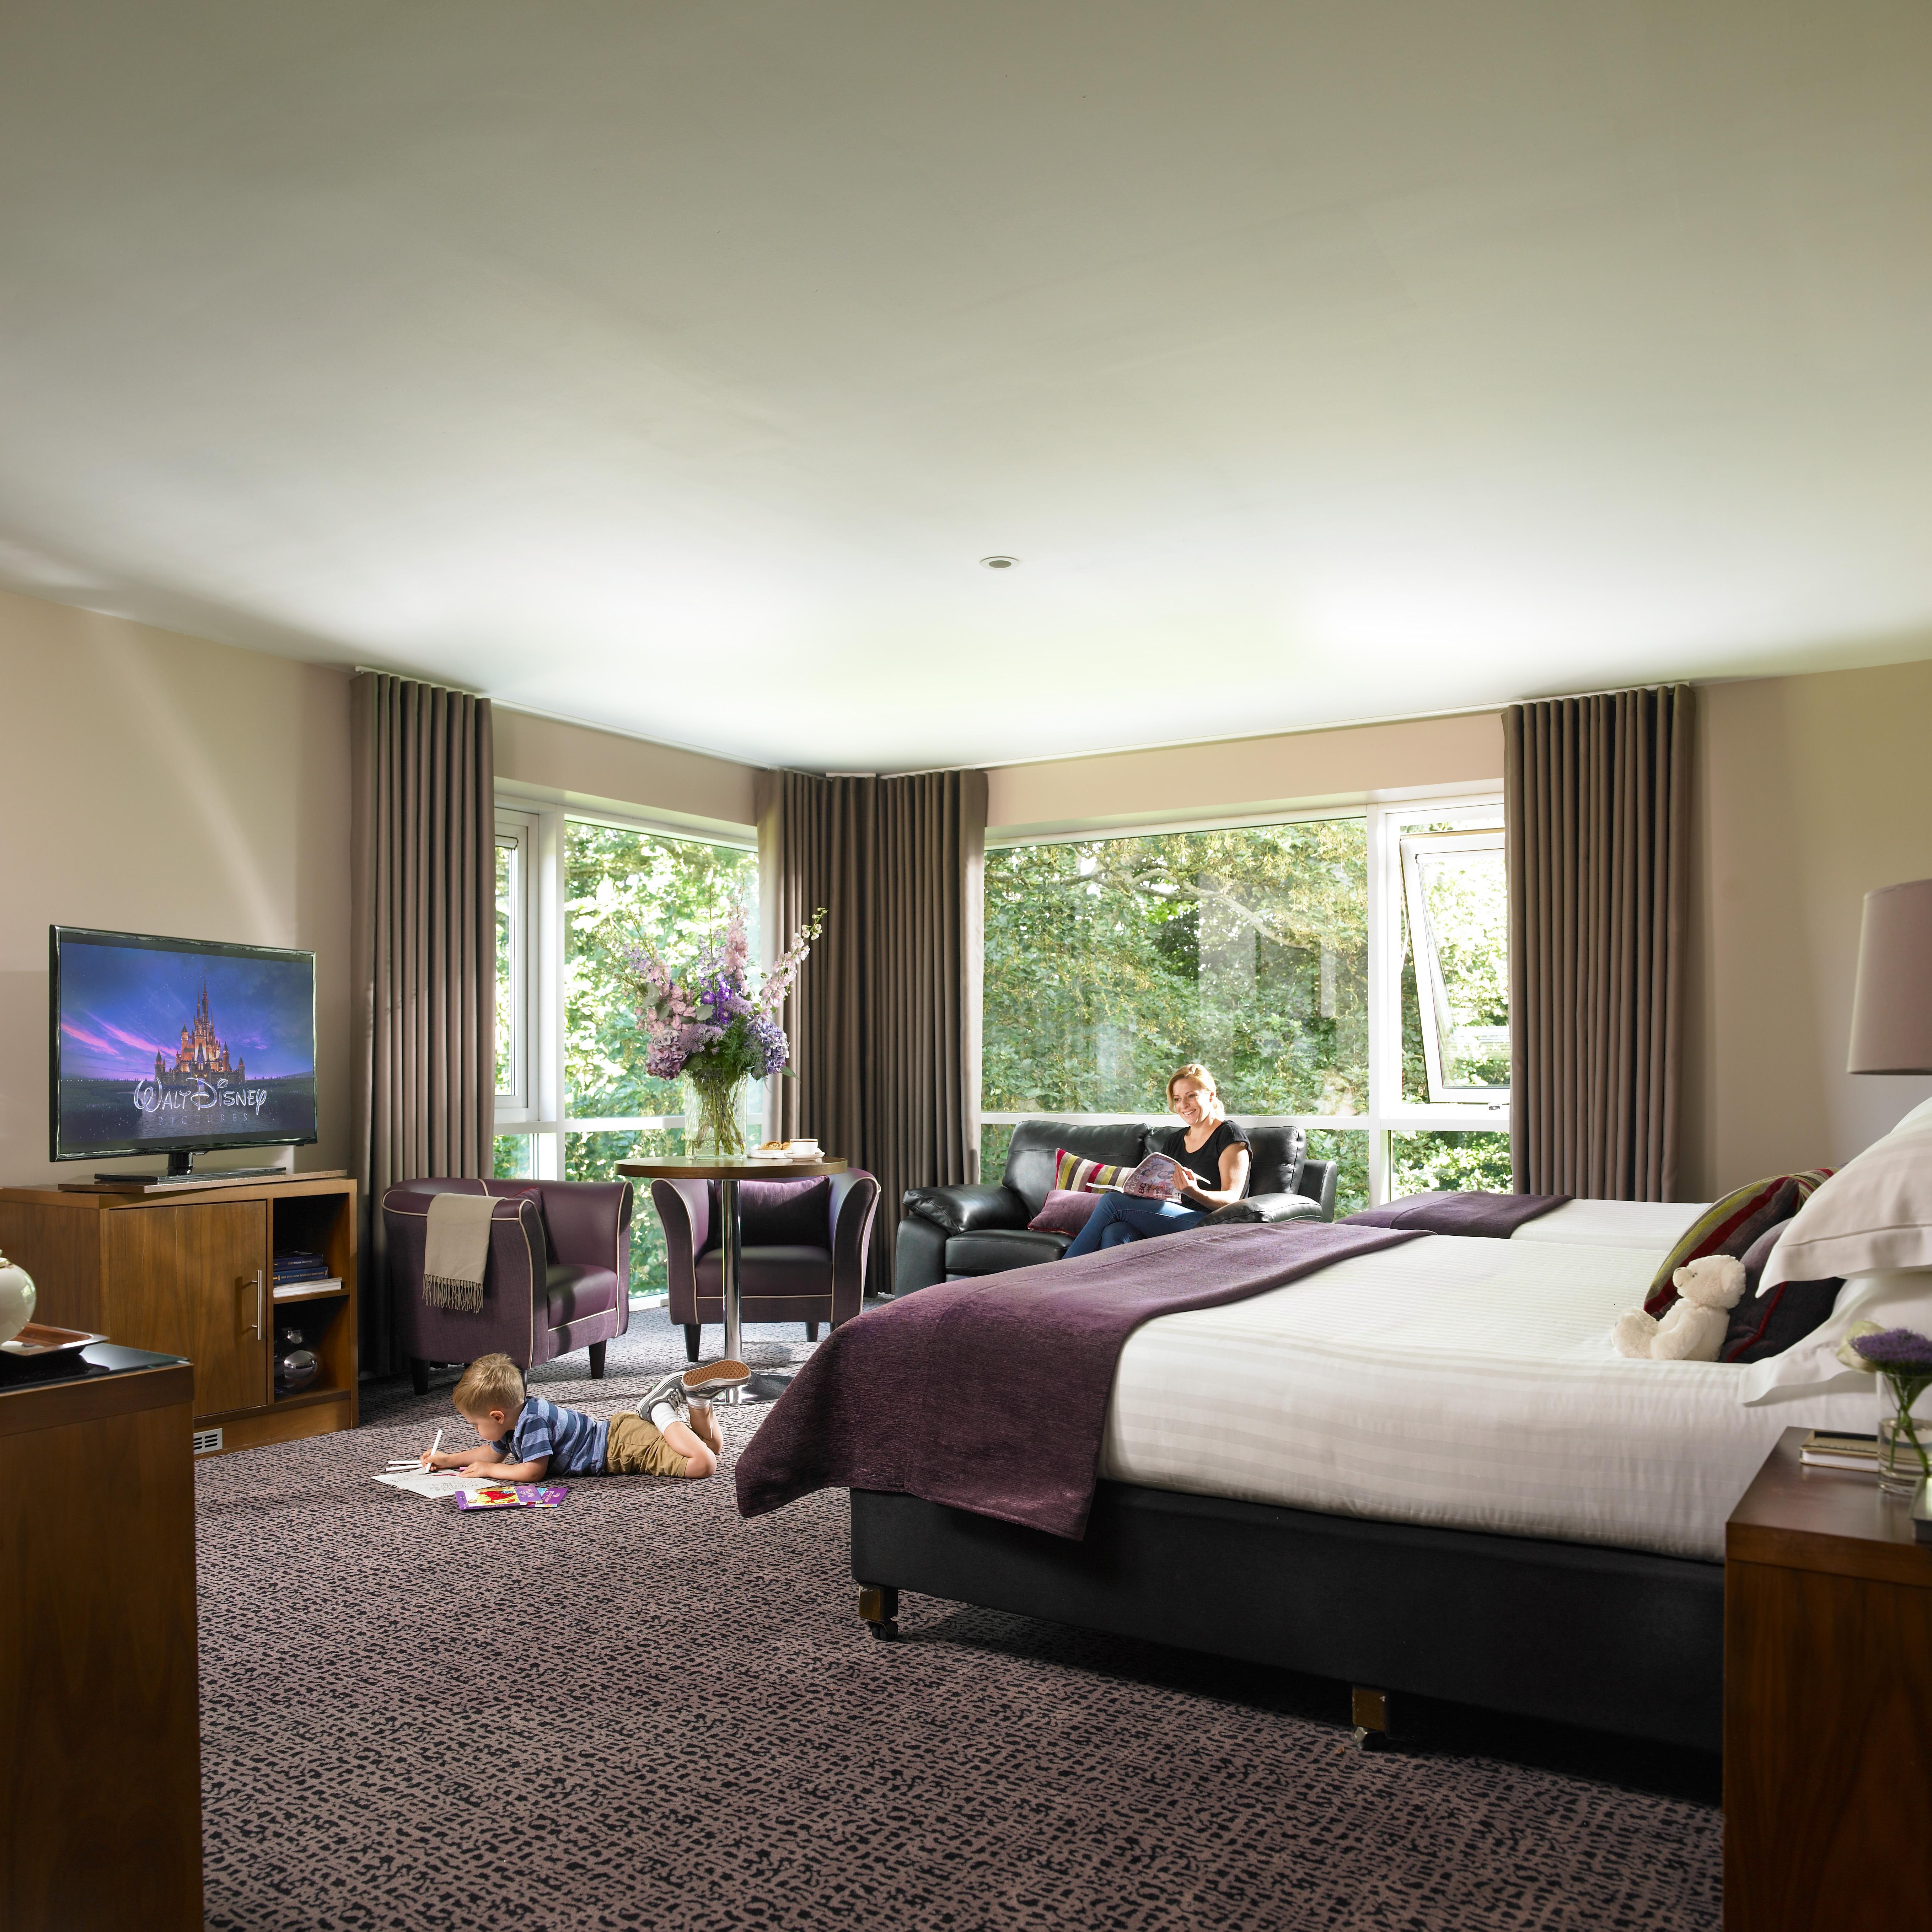 Hotel Room Image Gallery Dunboyne Castle Hotel Amp Spa